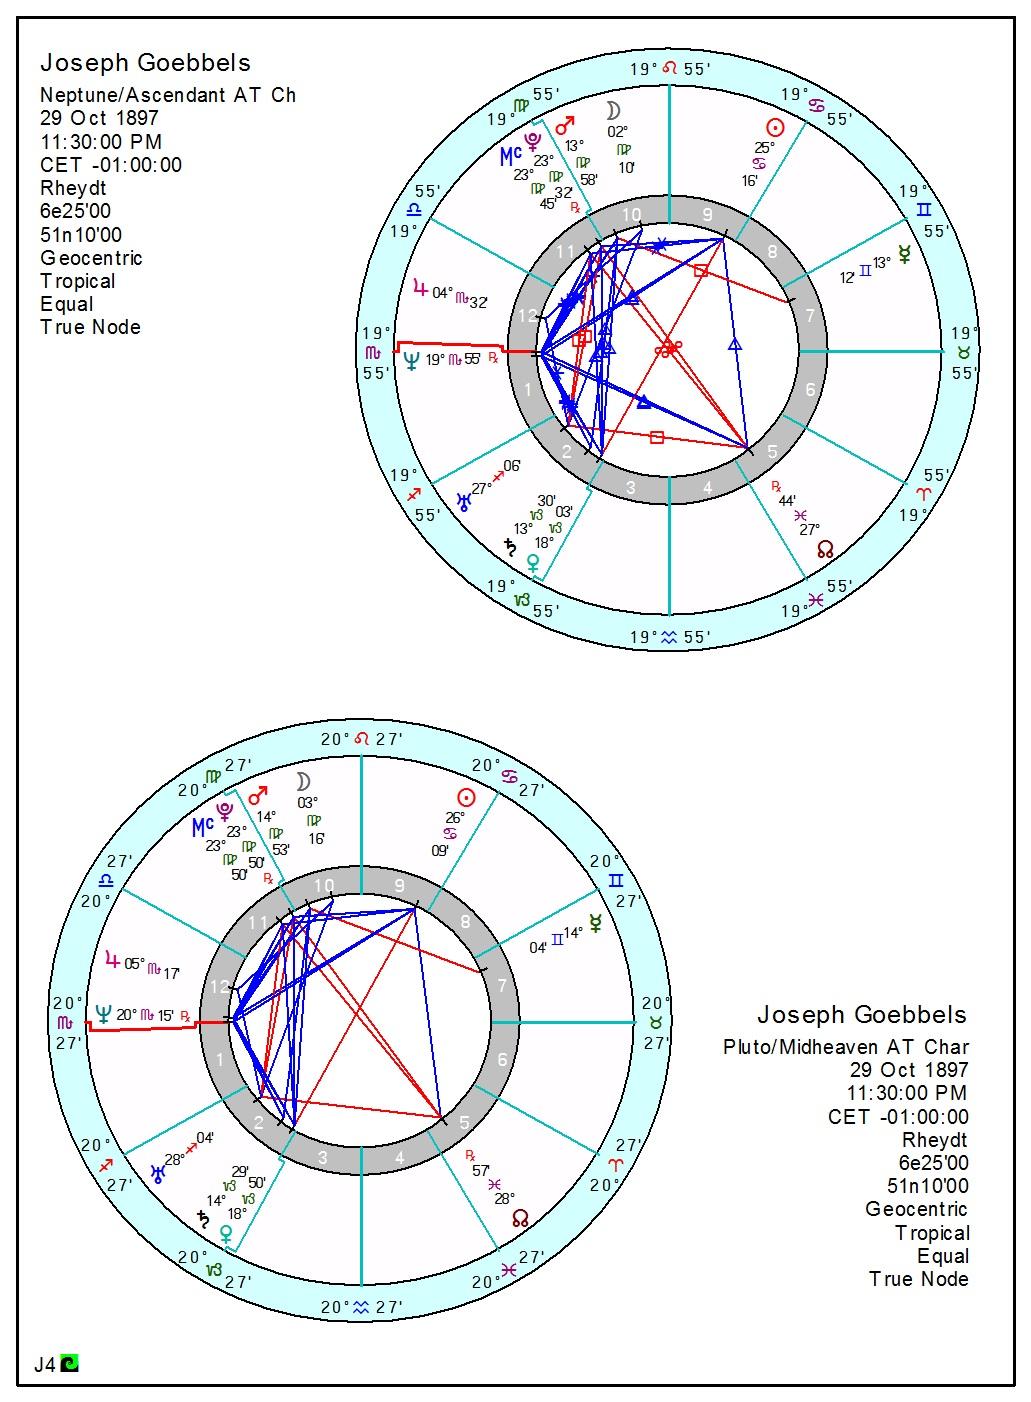 http://4.bp.blogspot.com/-fIVuxMKaMb8/UMKj2ayvaNI/AAAAAAAACMk/JHZg-JnFAr0/s1600/neptune+asc+plouto+mc.jpg